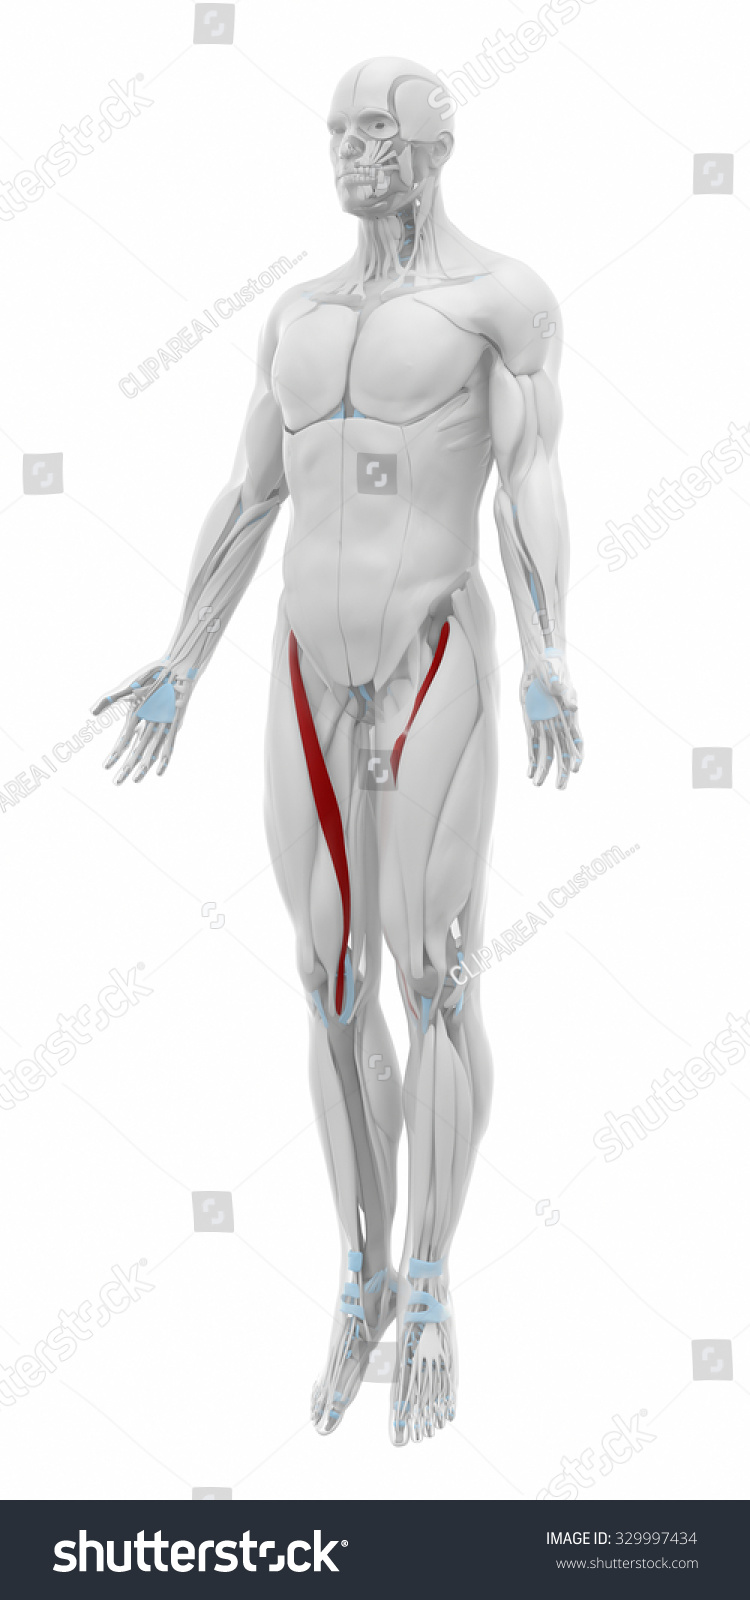 Sartorius Muscles Anatomy Map Stock Illustration Royalty Free